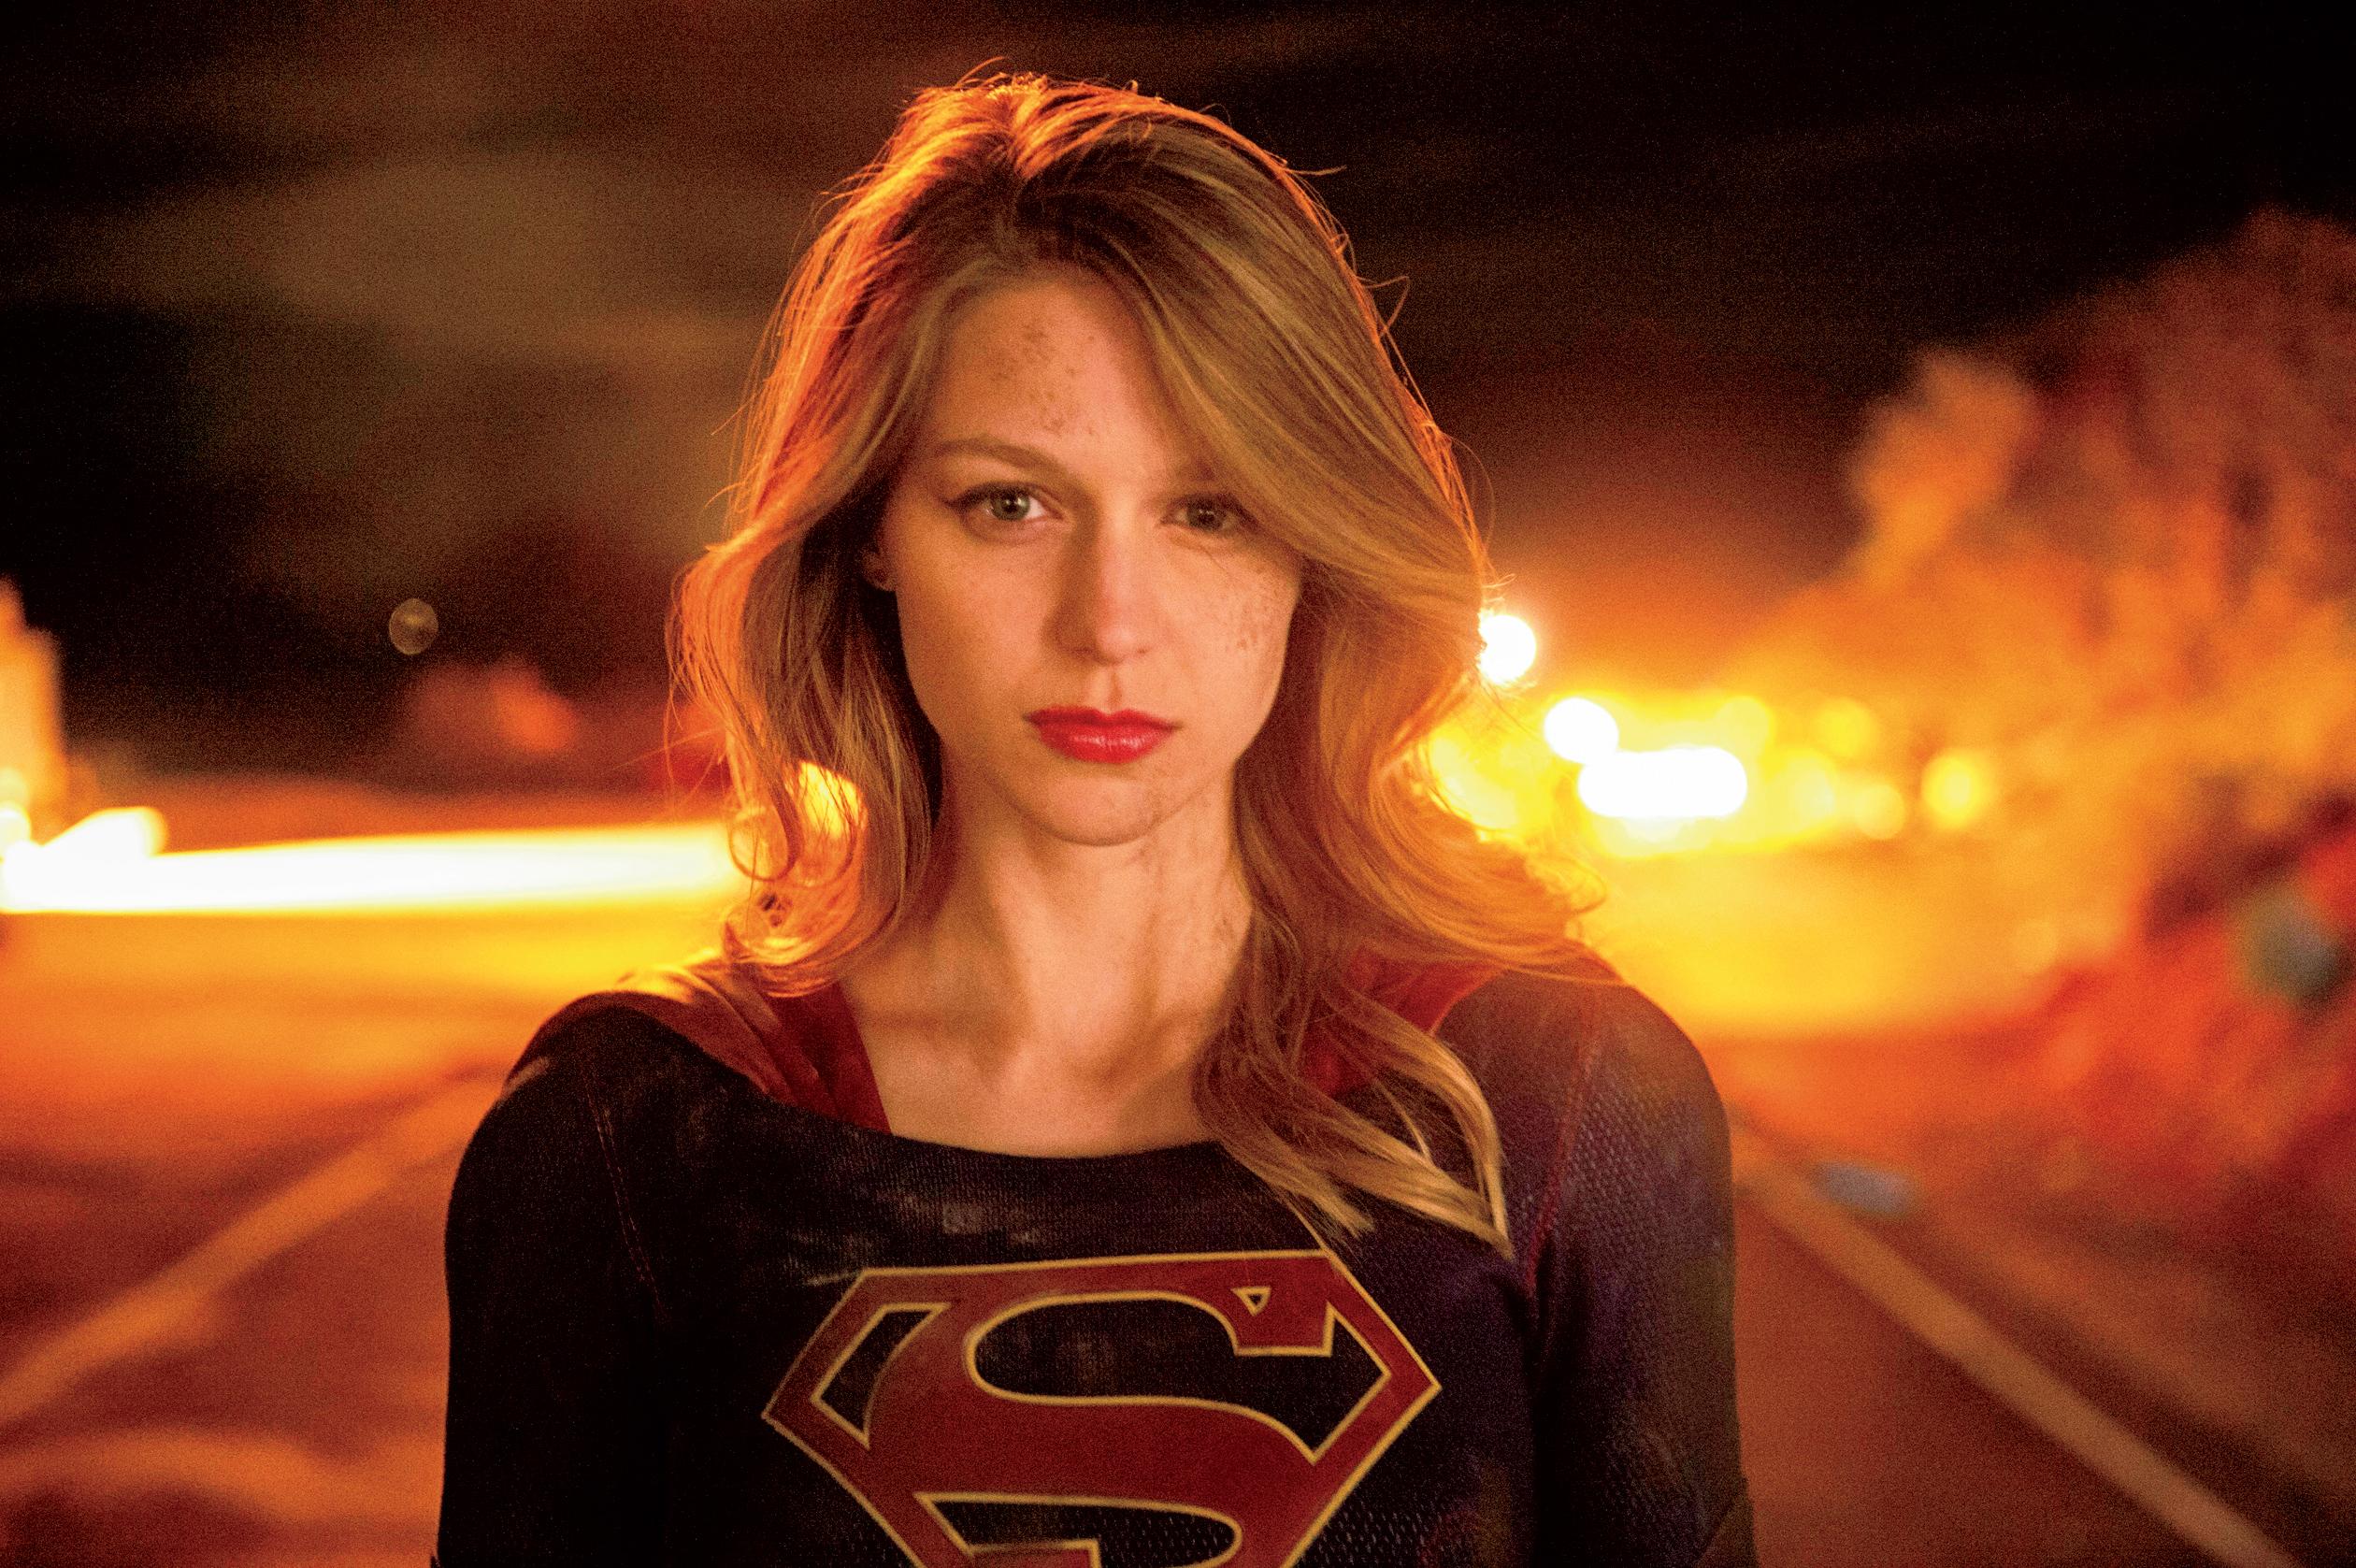 Resultado de imagem para supergirl wallpaper